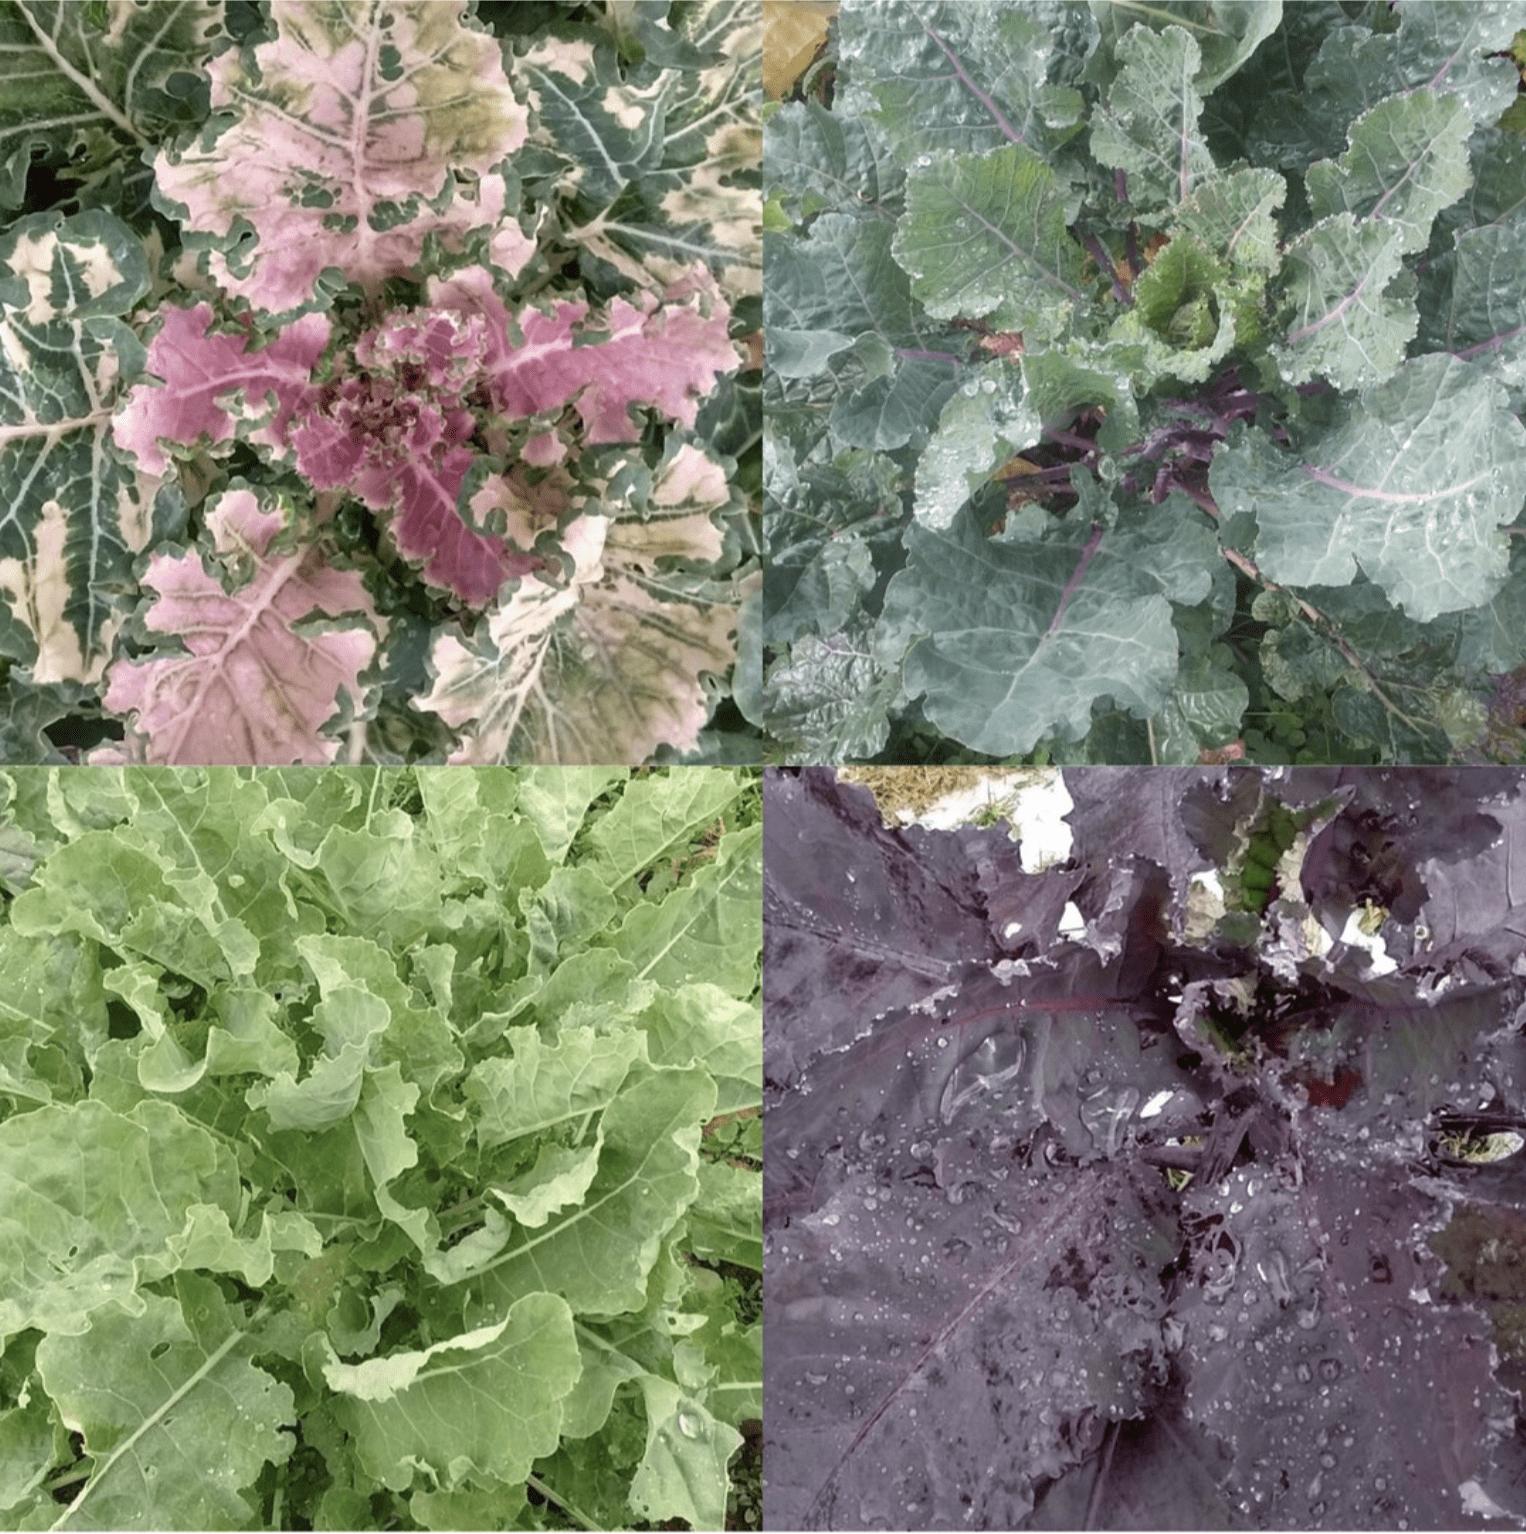 Amalgamation of four different photos of kale.